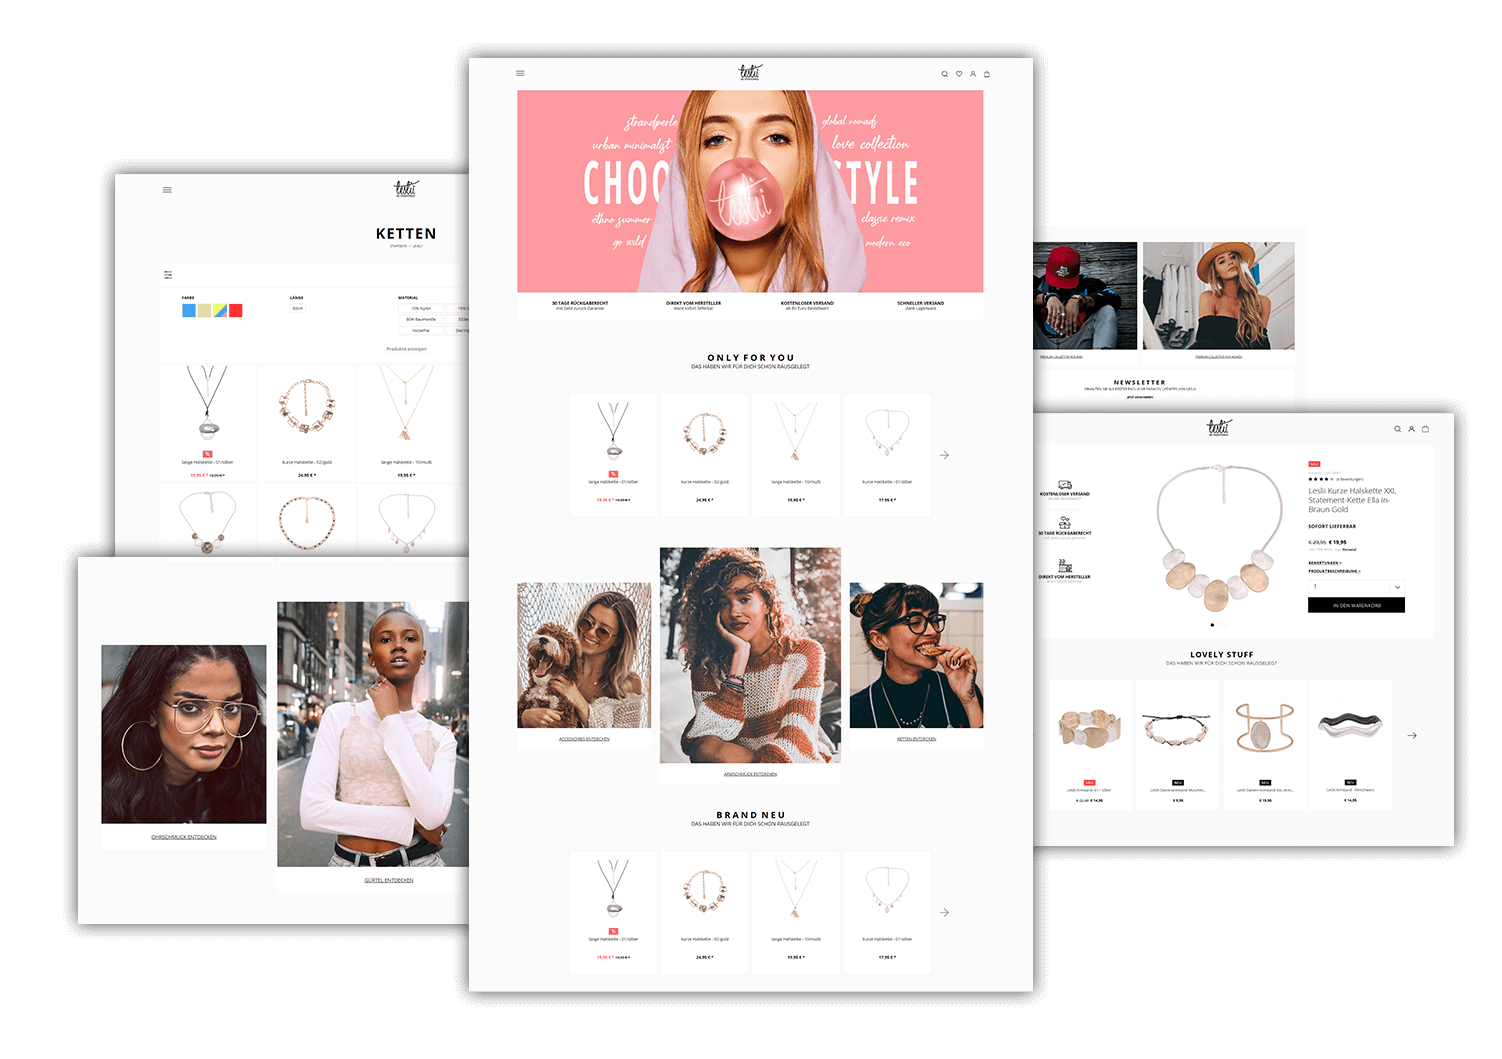 Layouting: E-Commerce-Agentur BS-Style GmbH. Desktop Preview: Shopware 5 Online Shop, Kunde: Leslii handgefertigte Accessoires.